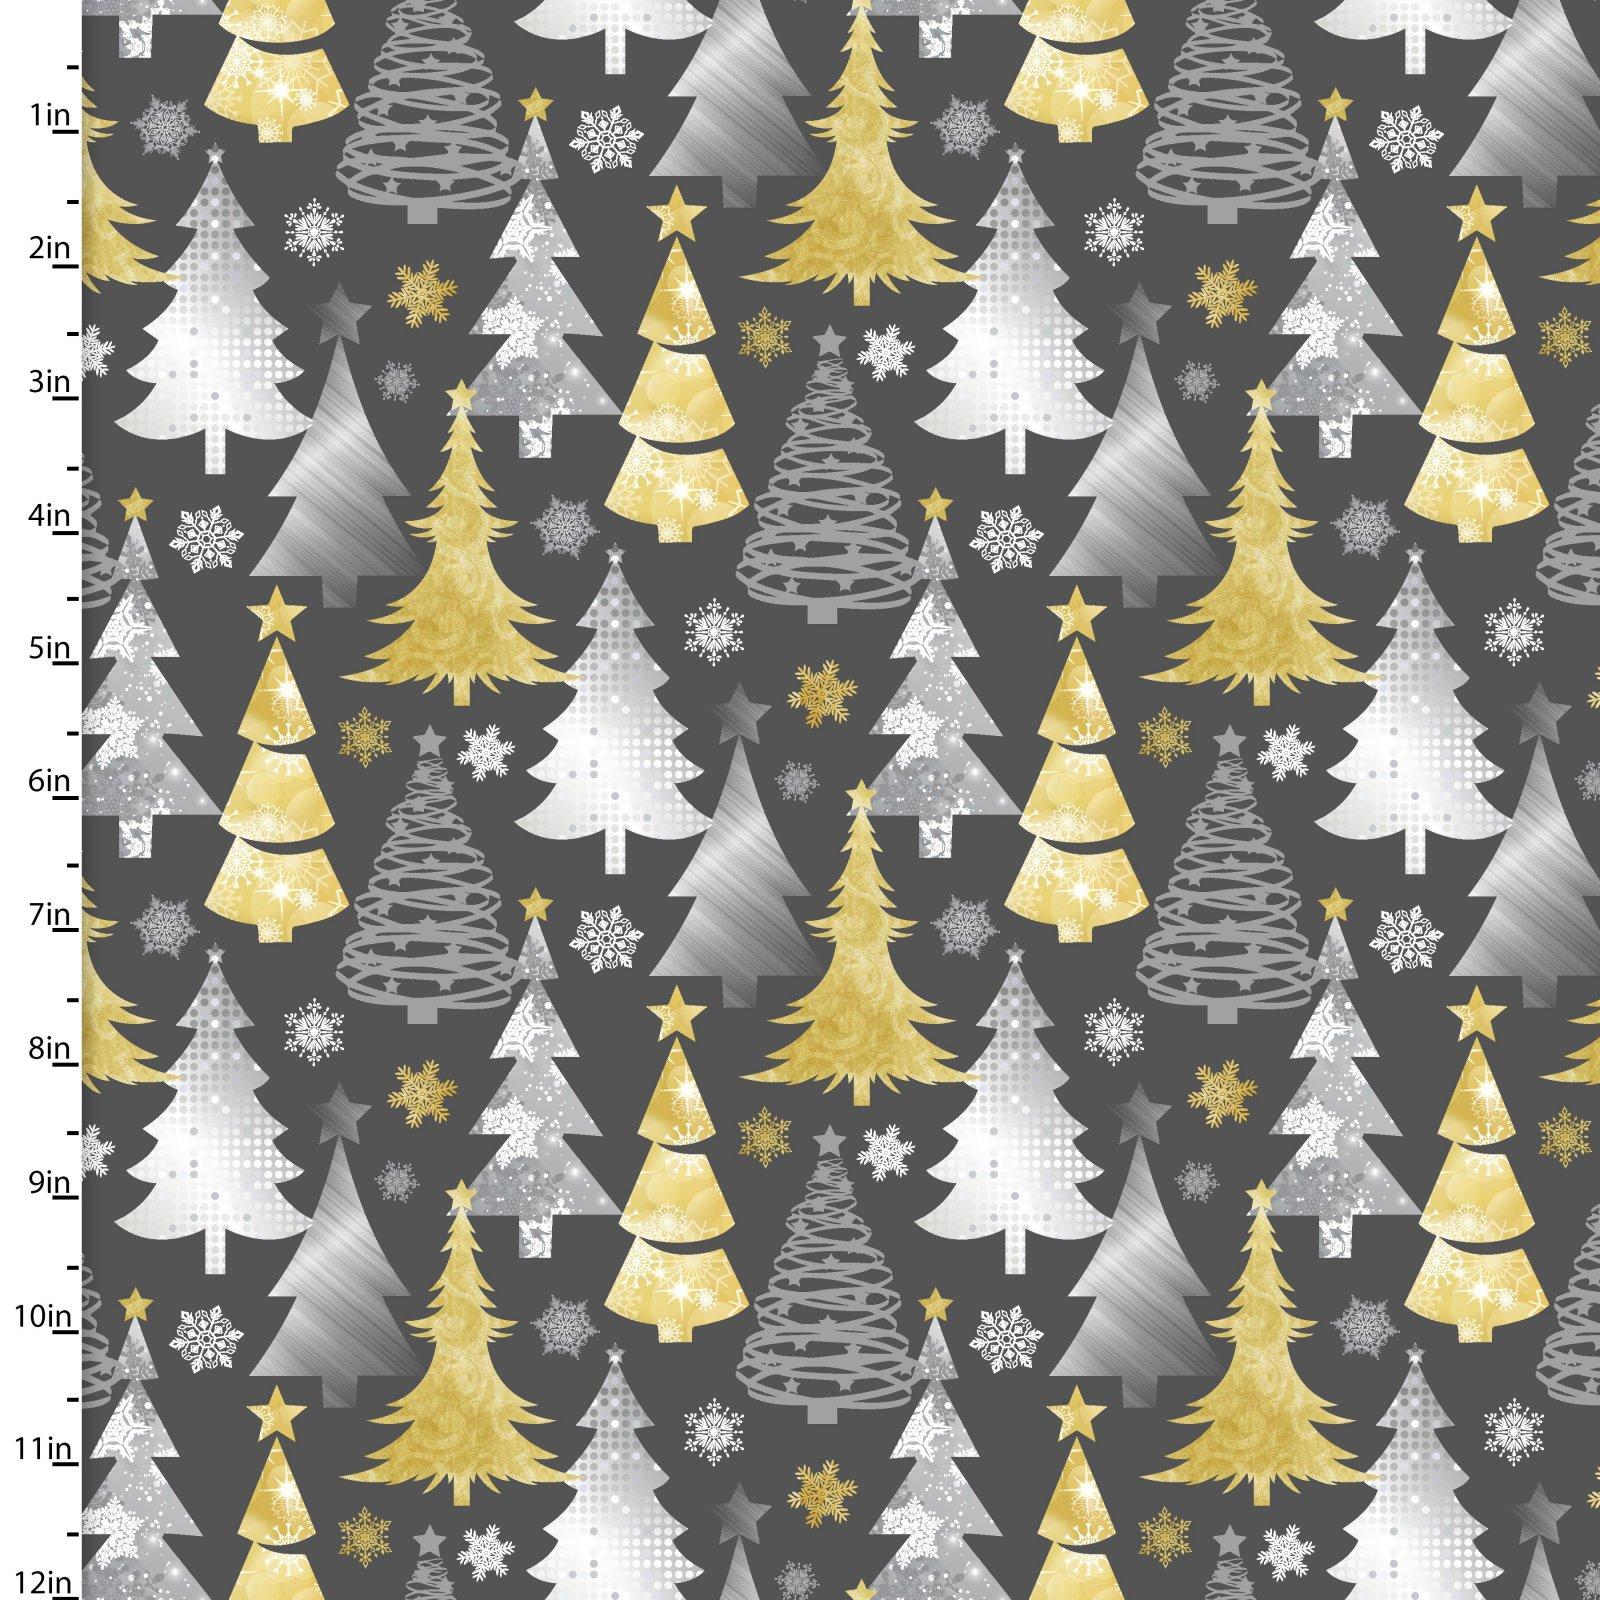 Metallic Forest <br>13908-DK GRAY